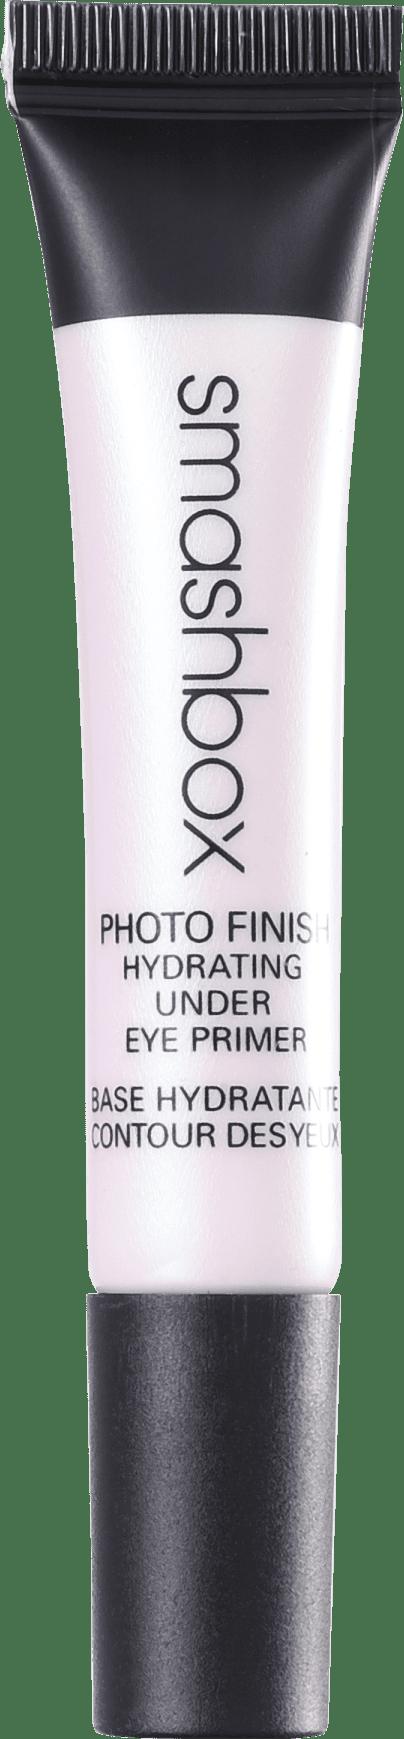 Primer Smashbox Photo Finish Hydrating Under Smashbox